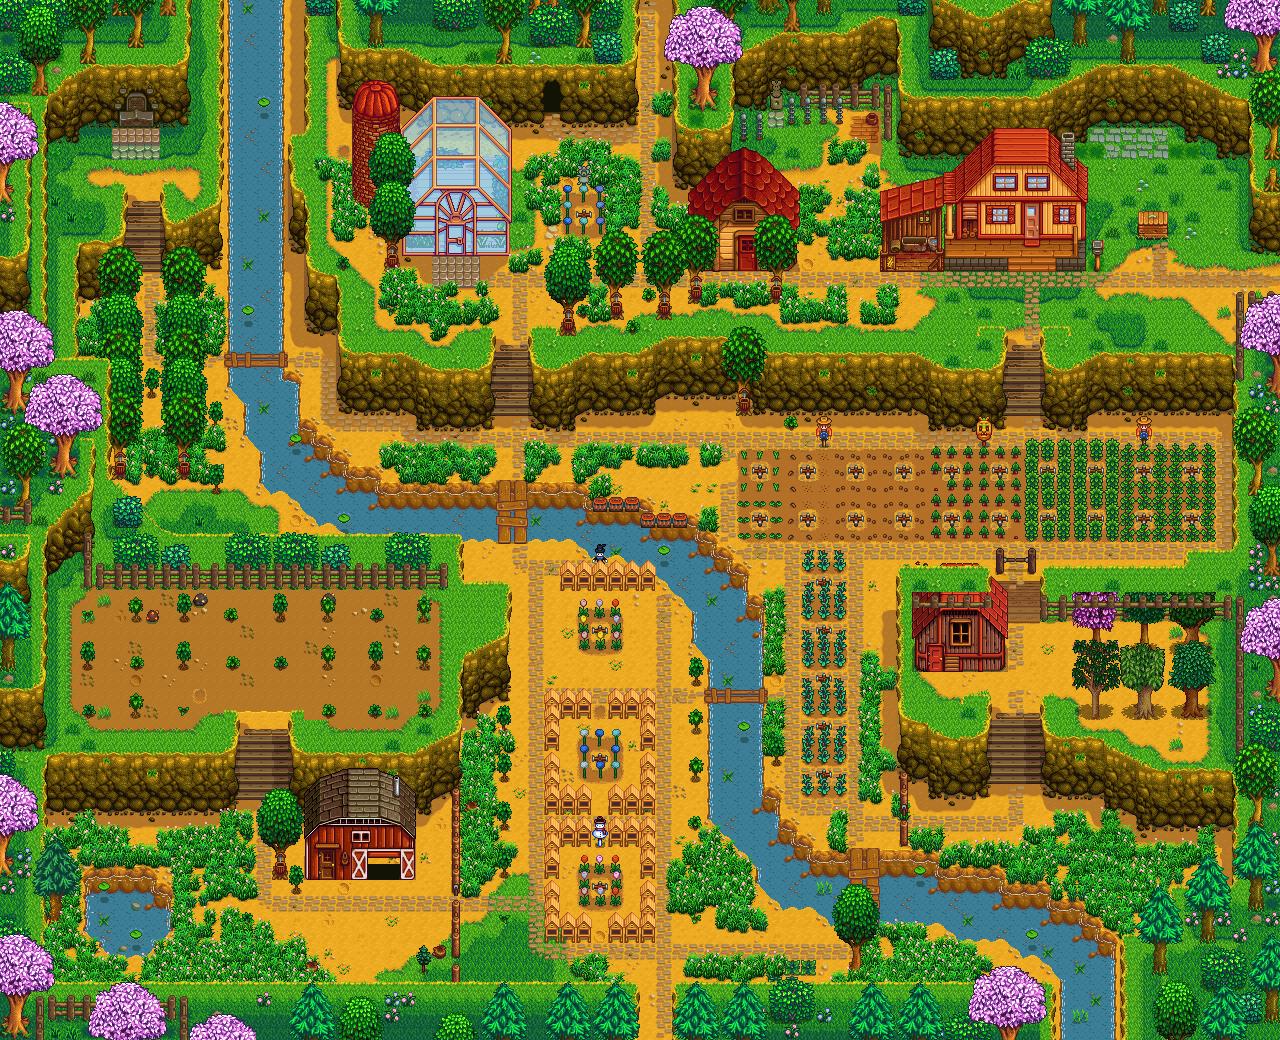 1ceyus M Png Imagen Png 1280 1040 Pixeles Escalado 61 Stardew Valley Stardew Valley Tips Farm Layout